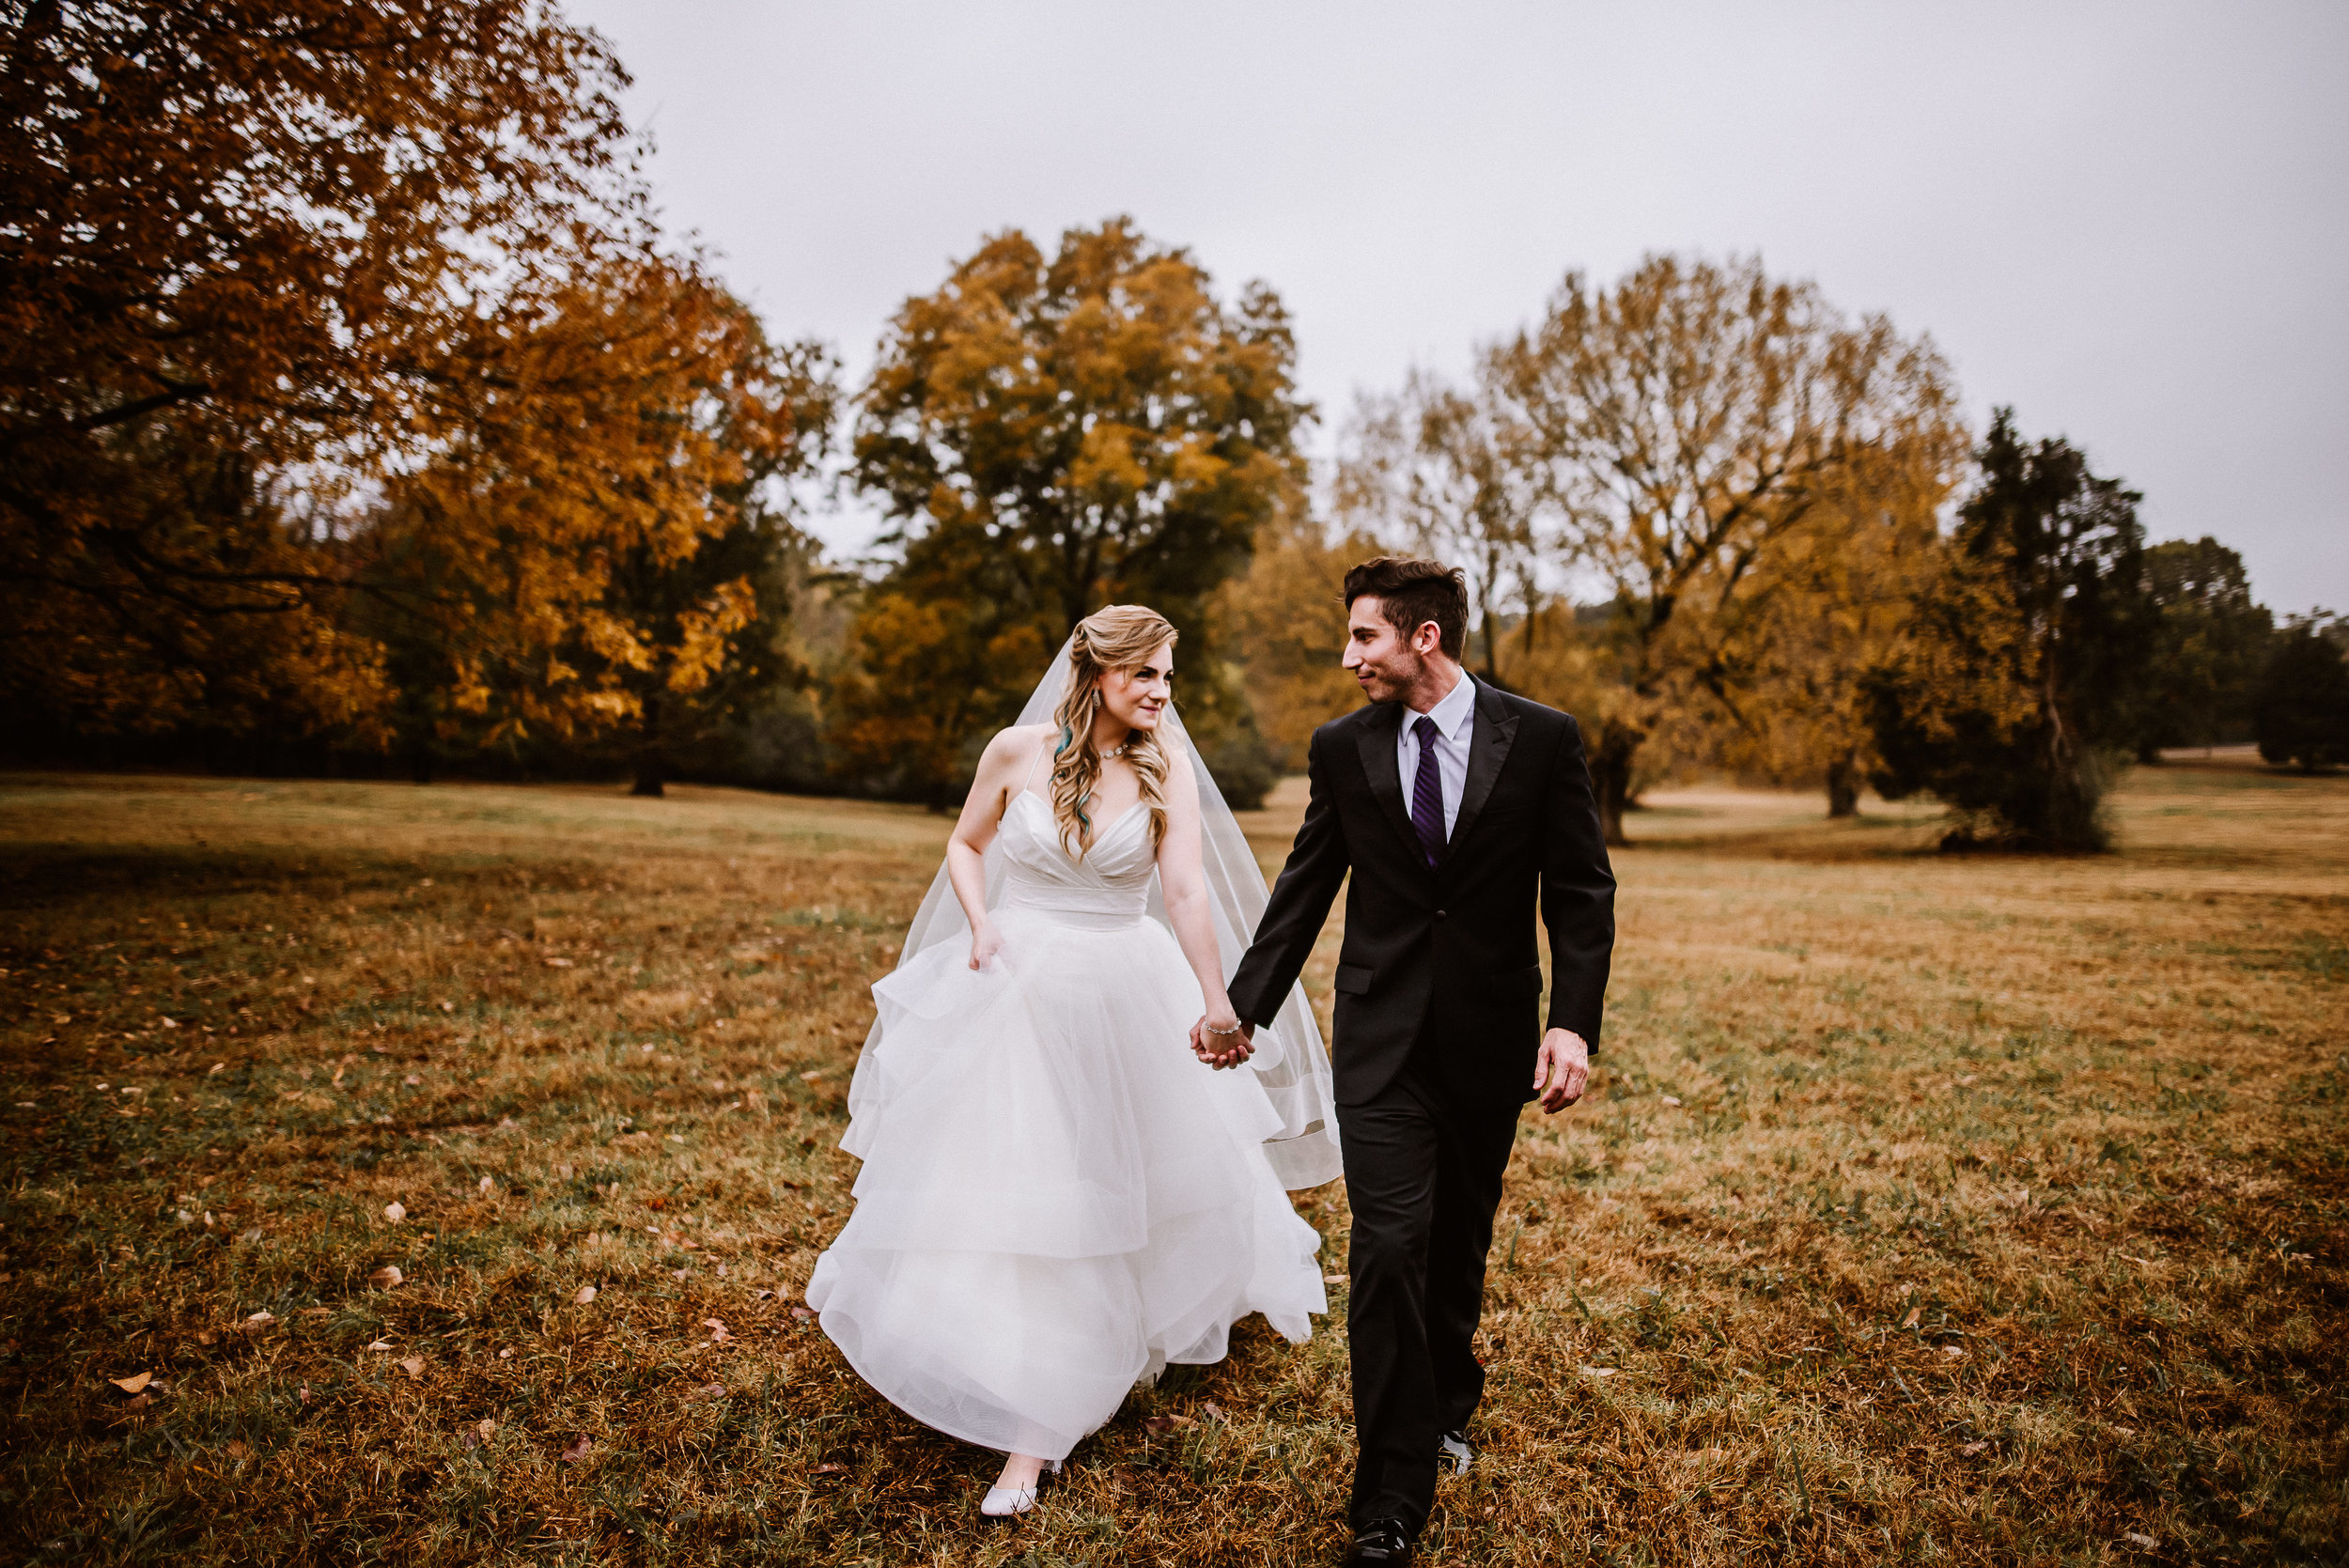 Lucchesi-Wedding_Shelby-Farms_Ashley-Benham-Photography-264.jpg